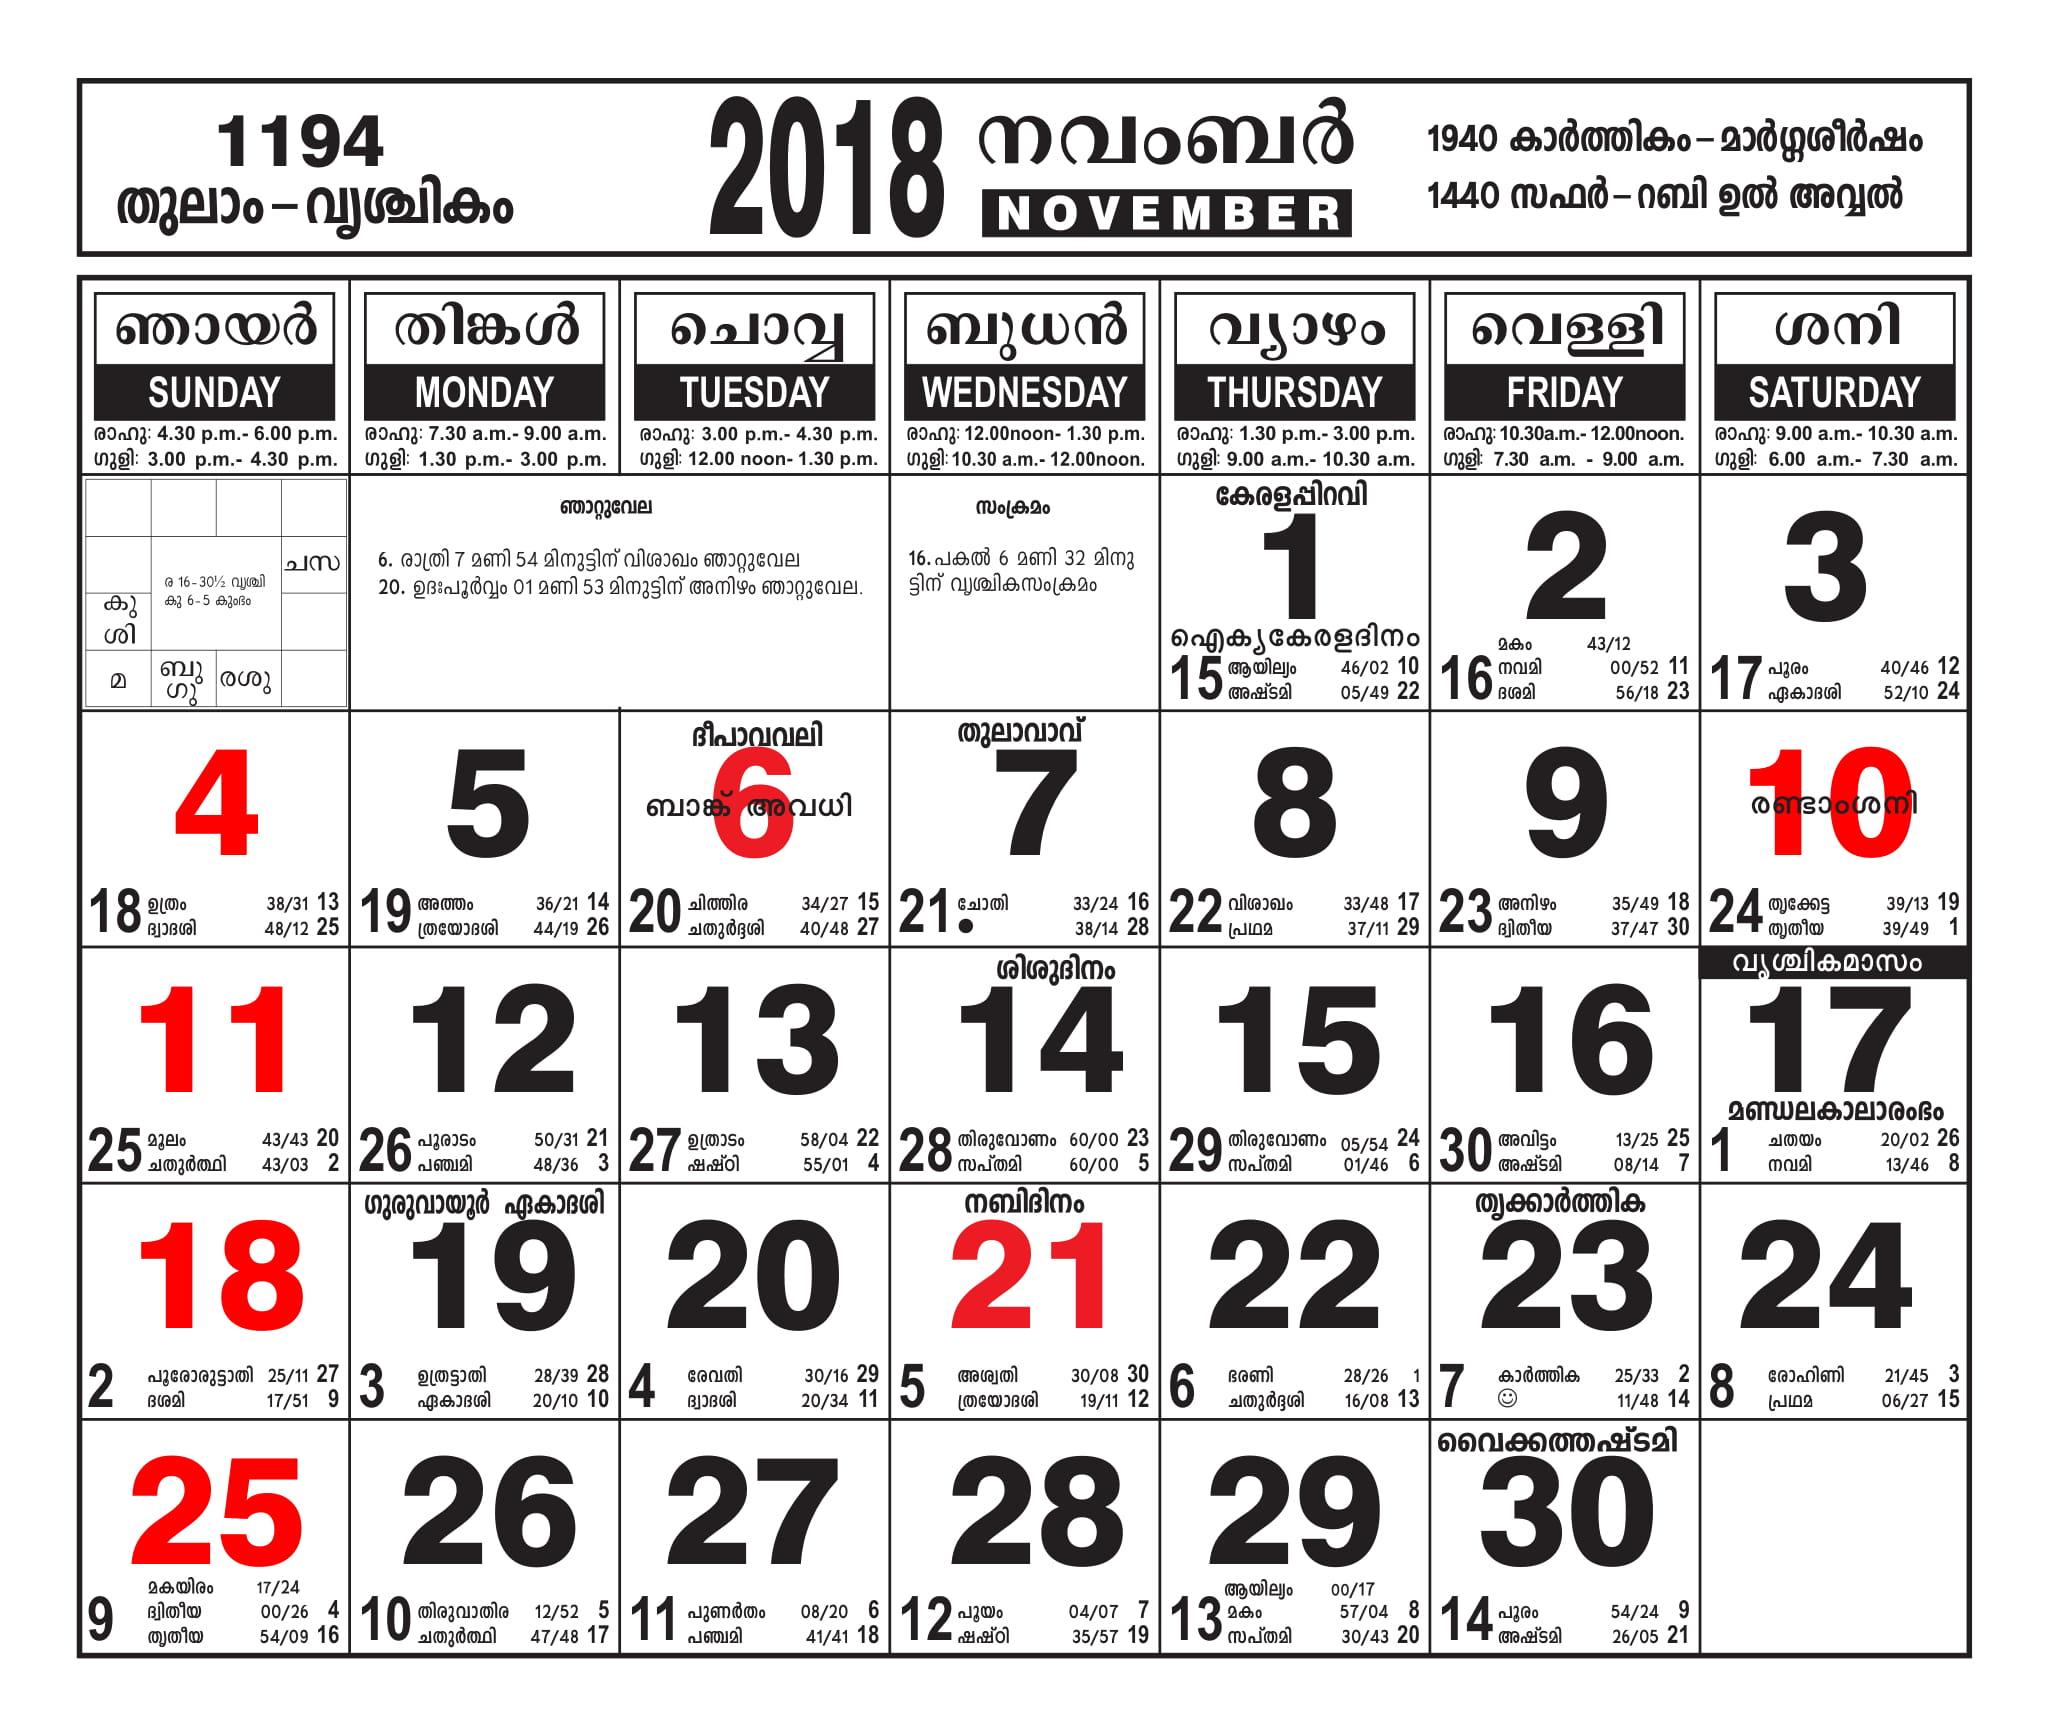 Malayalam Calendar 2020 November  Calendar Printable Free regarding Malayala Manorama Calendar 2021 November